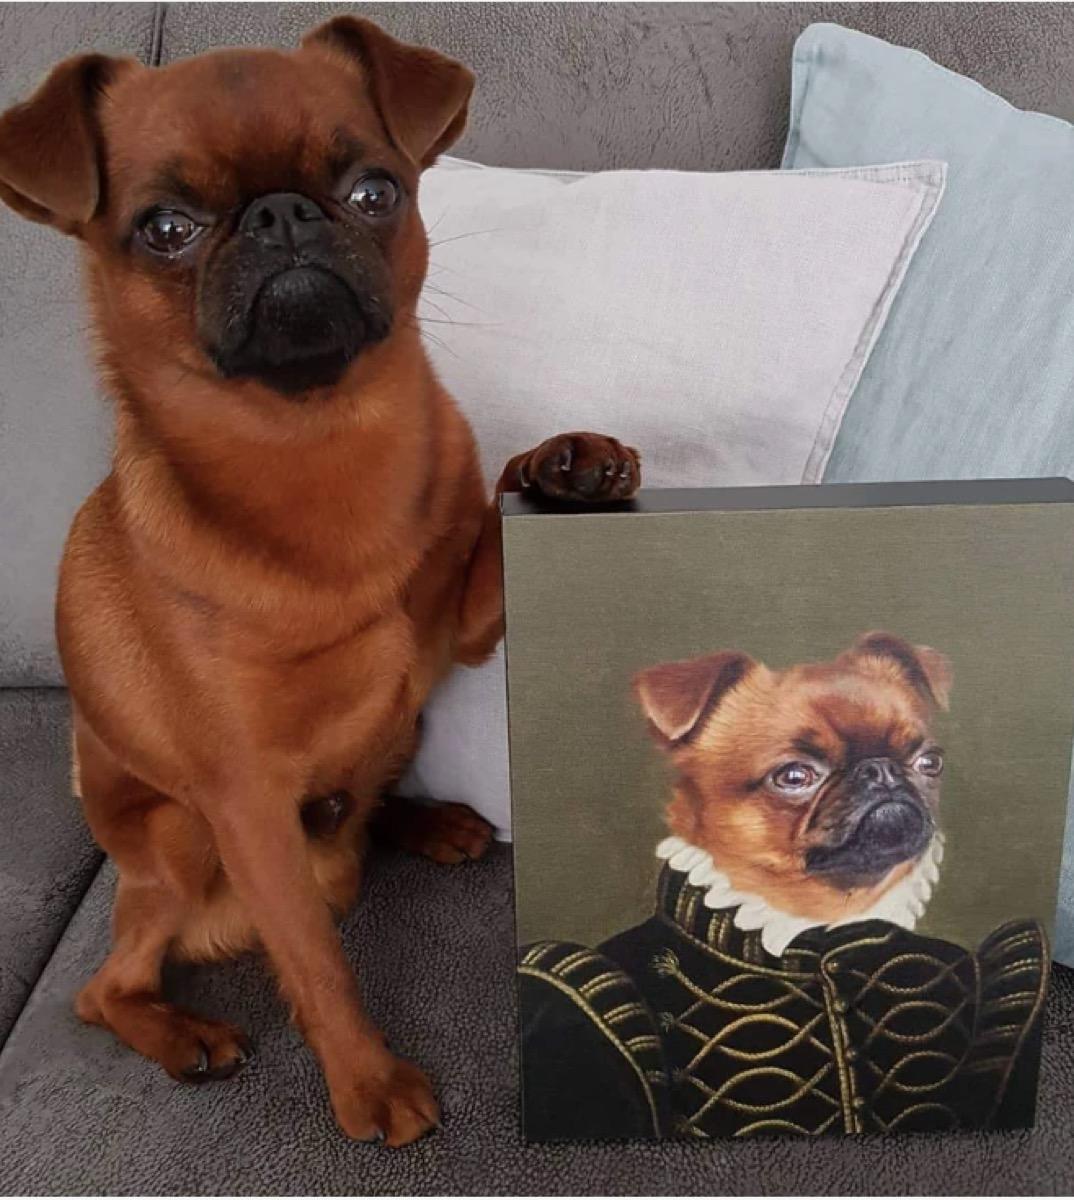 red dog sitting next to renaissance portrait of himself